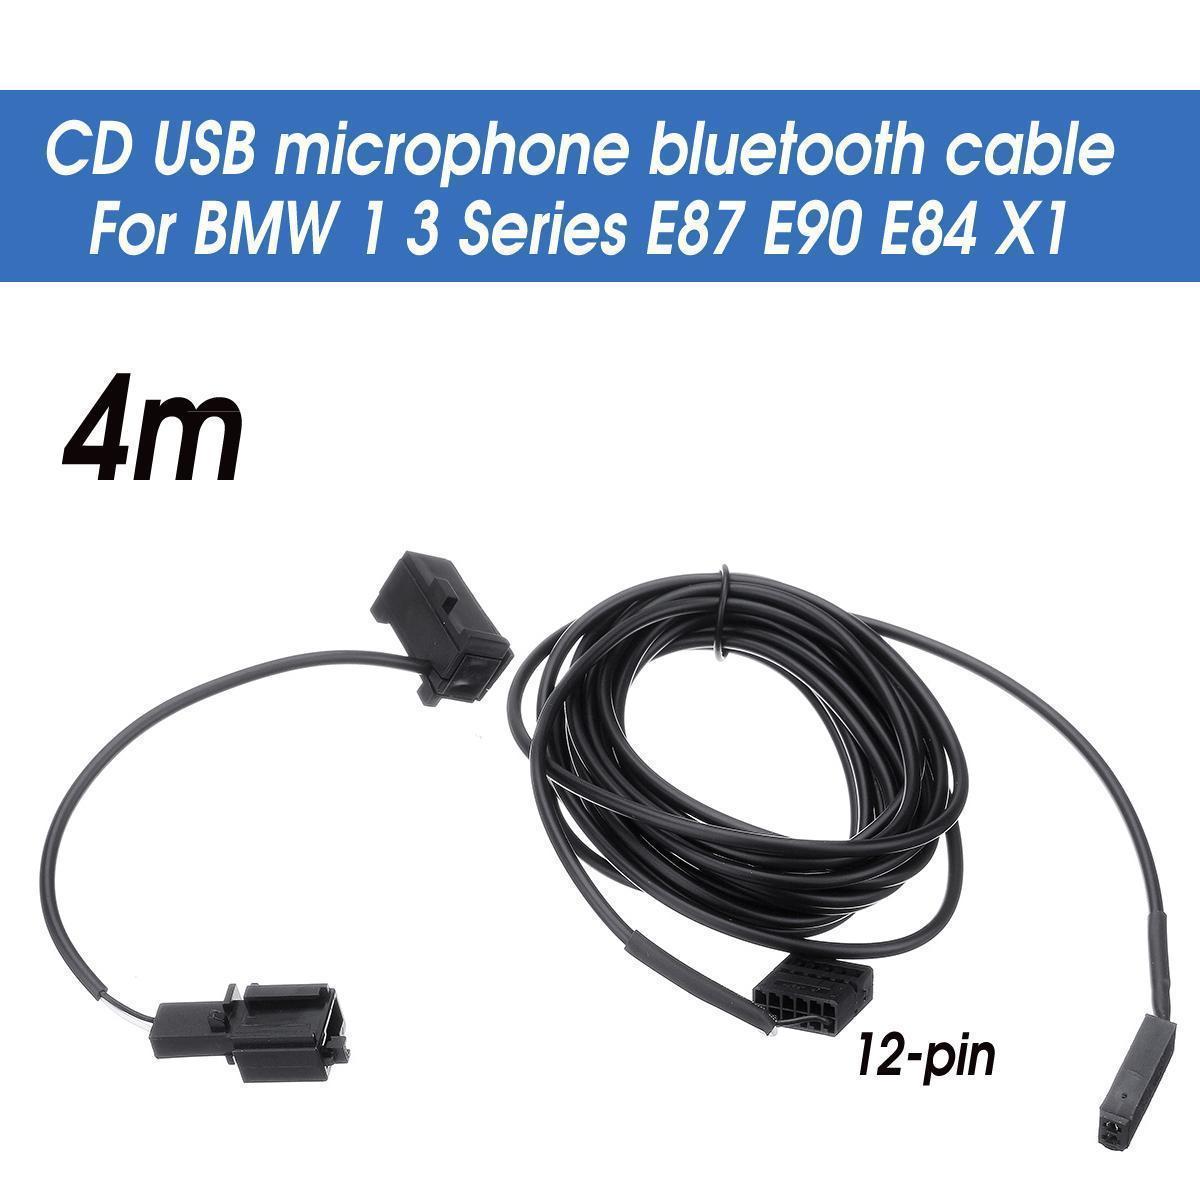 Speeding Professiona CD USB Microphone Bluetooth Cable For BMW 1 3 Series  E87 E90 E84 X1